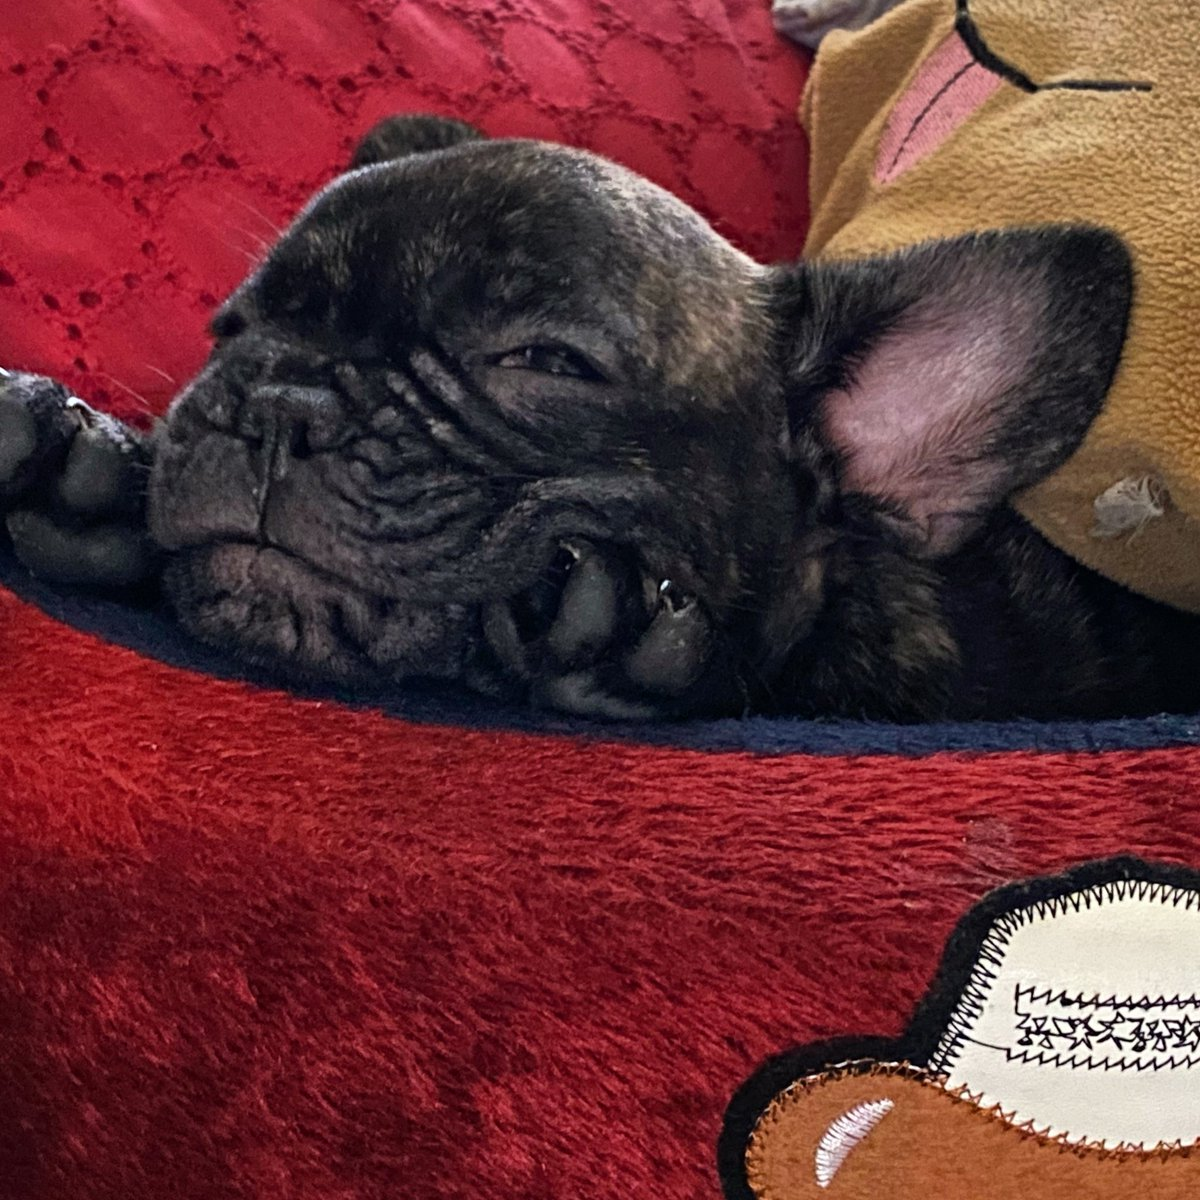 Lazy Morning 😴❤️🐶 #sleepypuppy #sleepy #marvel  #goodmorning #goodvibes #photography #petphotography #lovephotography #lovepuppies #animalpgotography #photographylovers #hobbyphotography #hobby #shots #shotoniphone #iphonography #shotoniphone11pro #beautifulphotography https://t.co/DTSqloJRxS